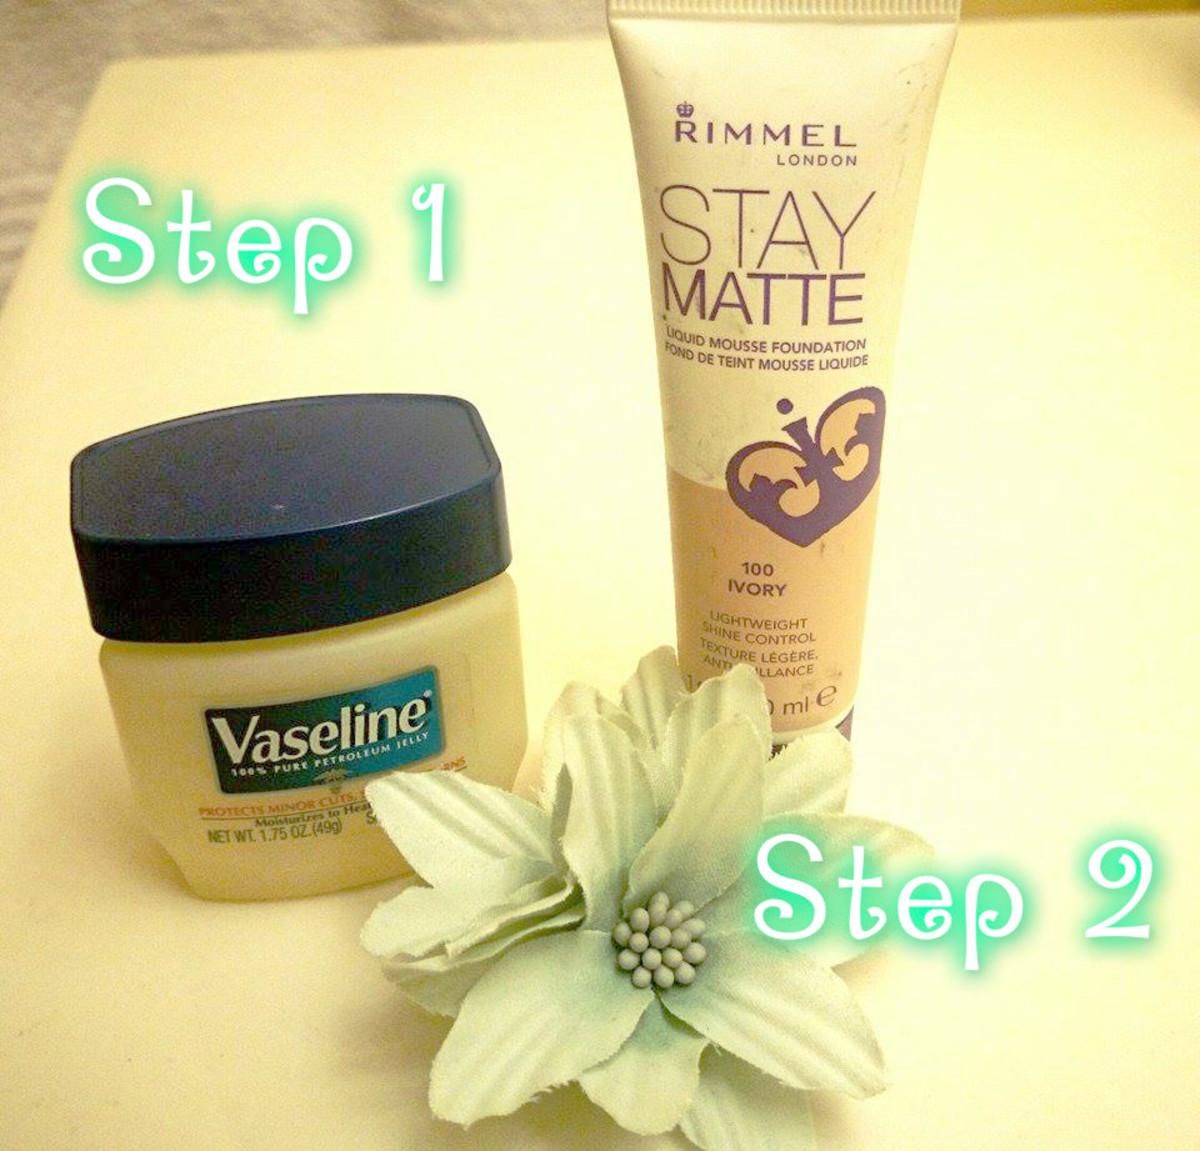 Vaseline helps your foundation look natural like no primer ever could.